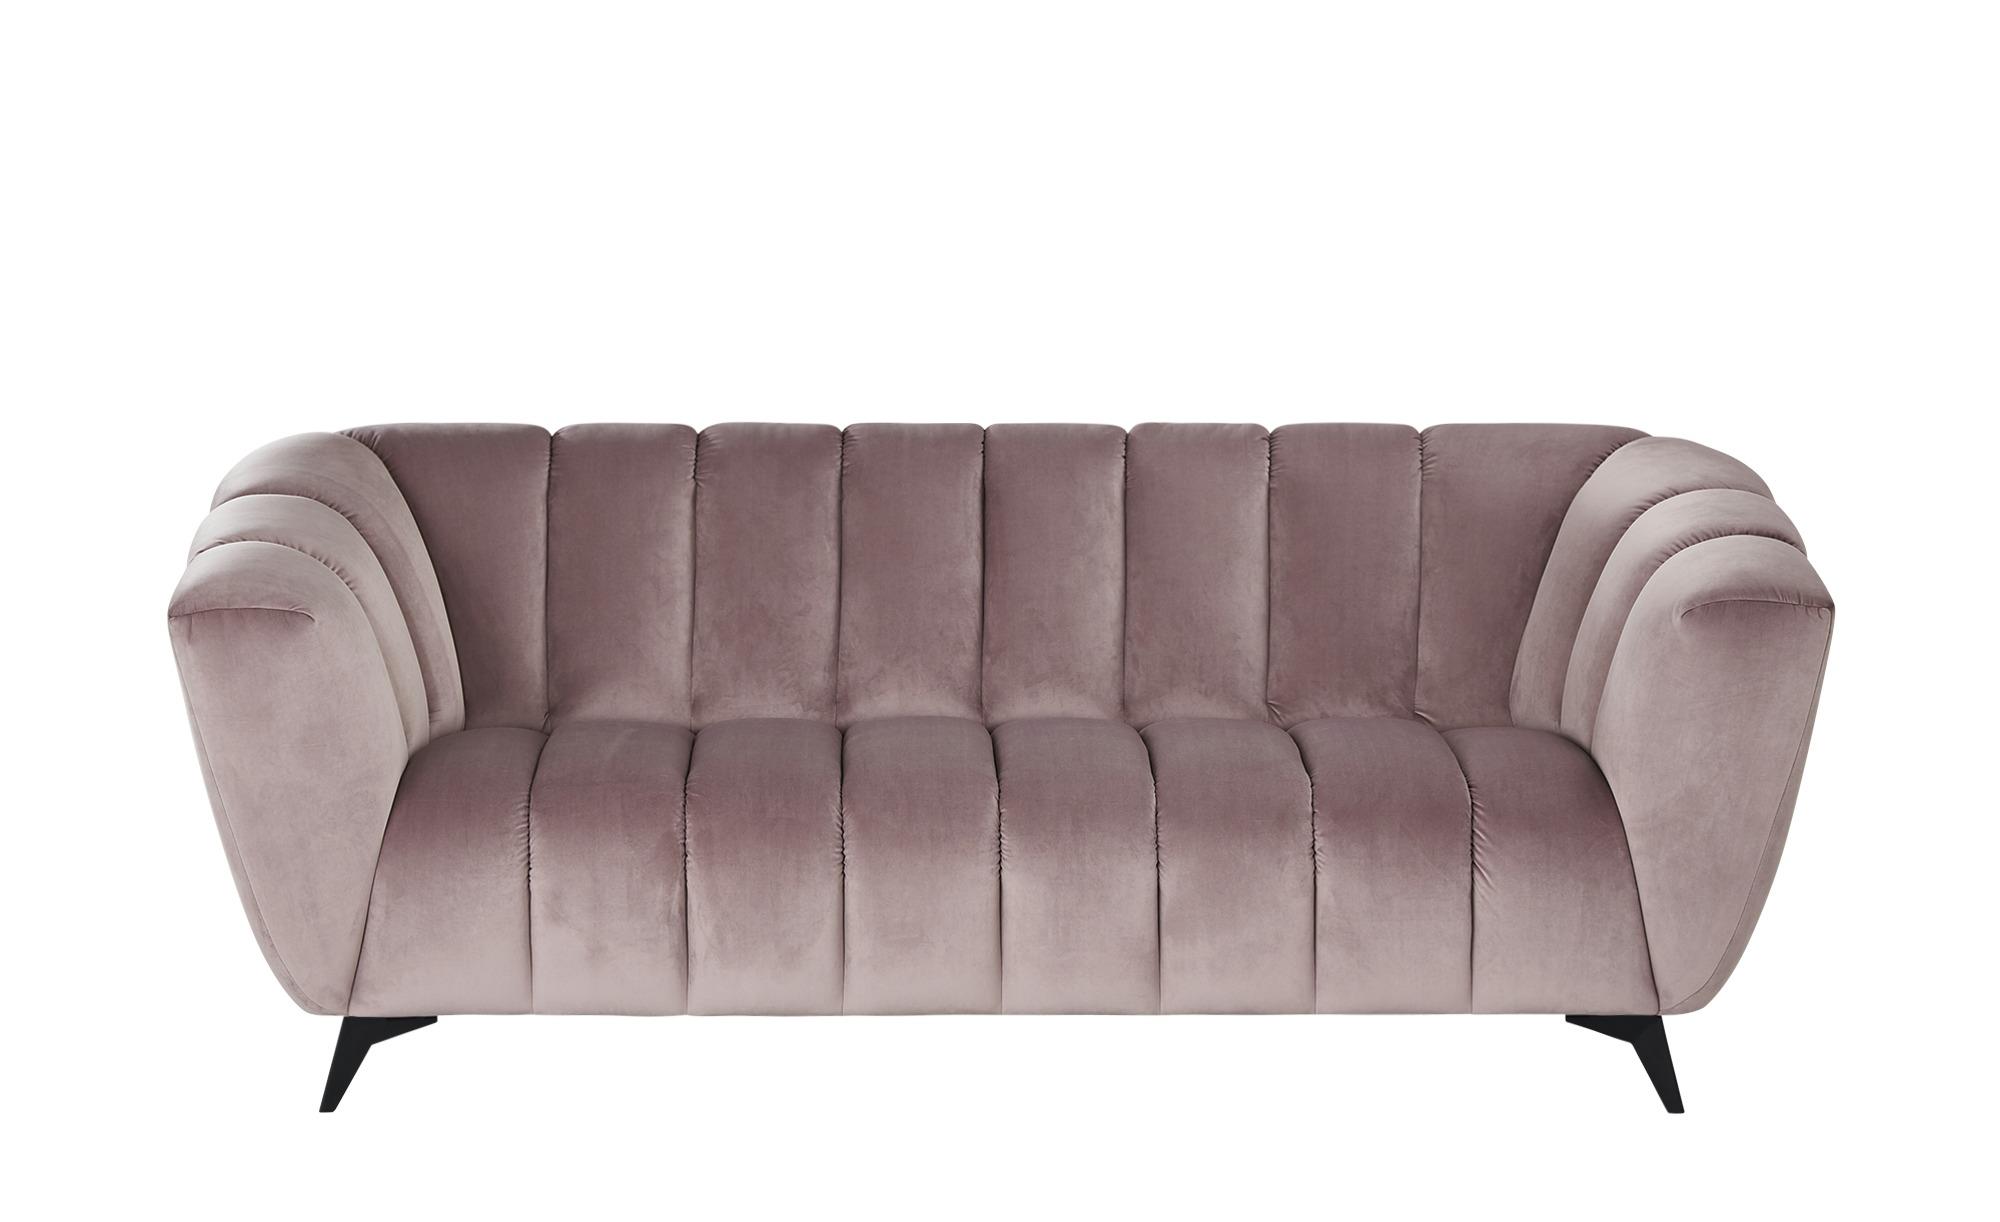 Sofa  Samantha ¦ rosa/pink ¦ Maße (cm): B: 220 H: 86 T: 100 Polstermöbel > Sofas > 3-Sitzer - Höffner